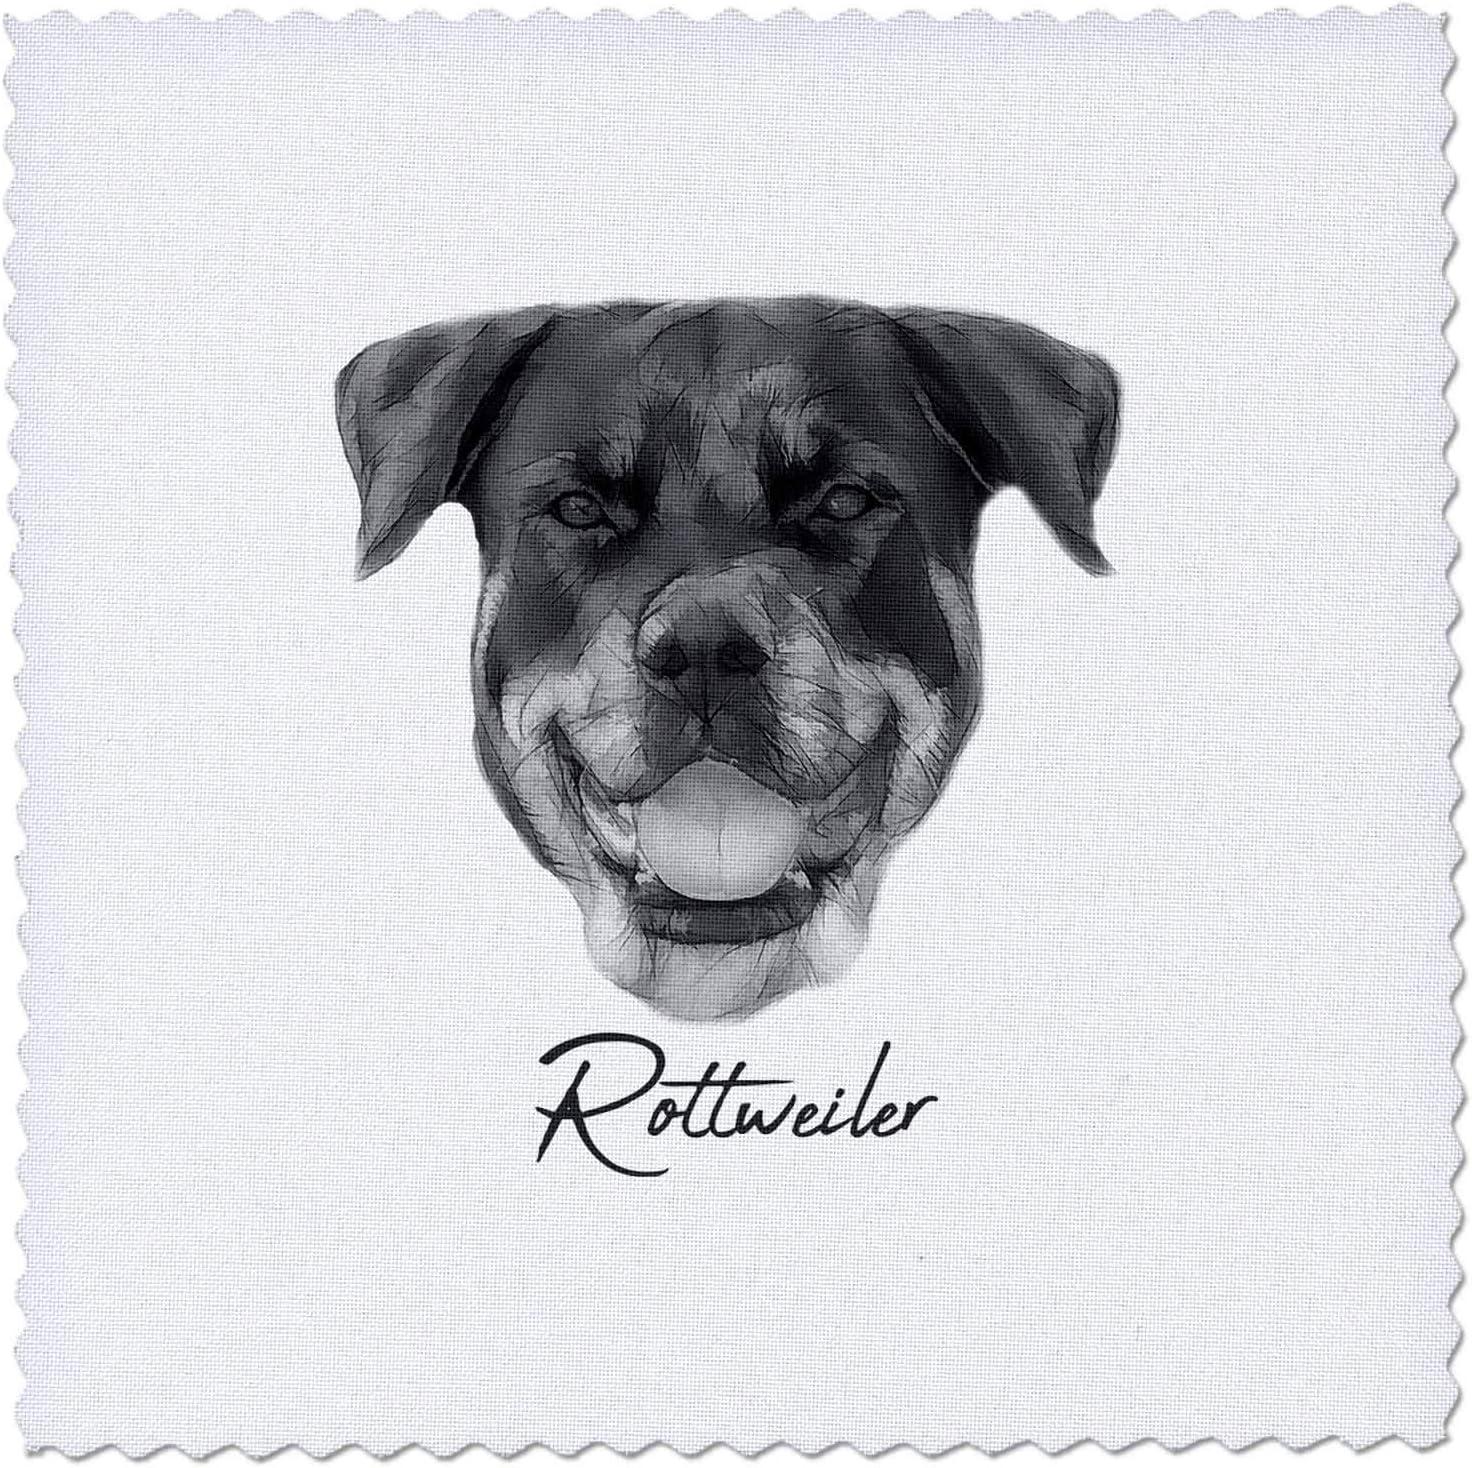 3dRose Alexis Atlanta Mall Luxury goods Design - Dog Breed Rottweiler dog in bl portrait